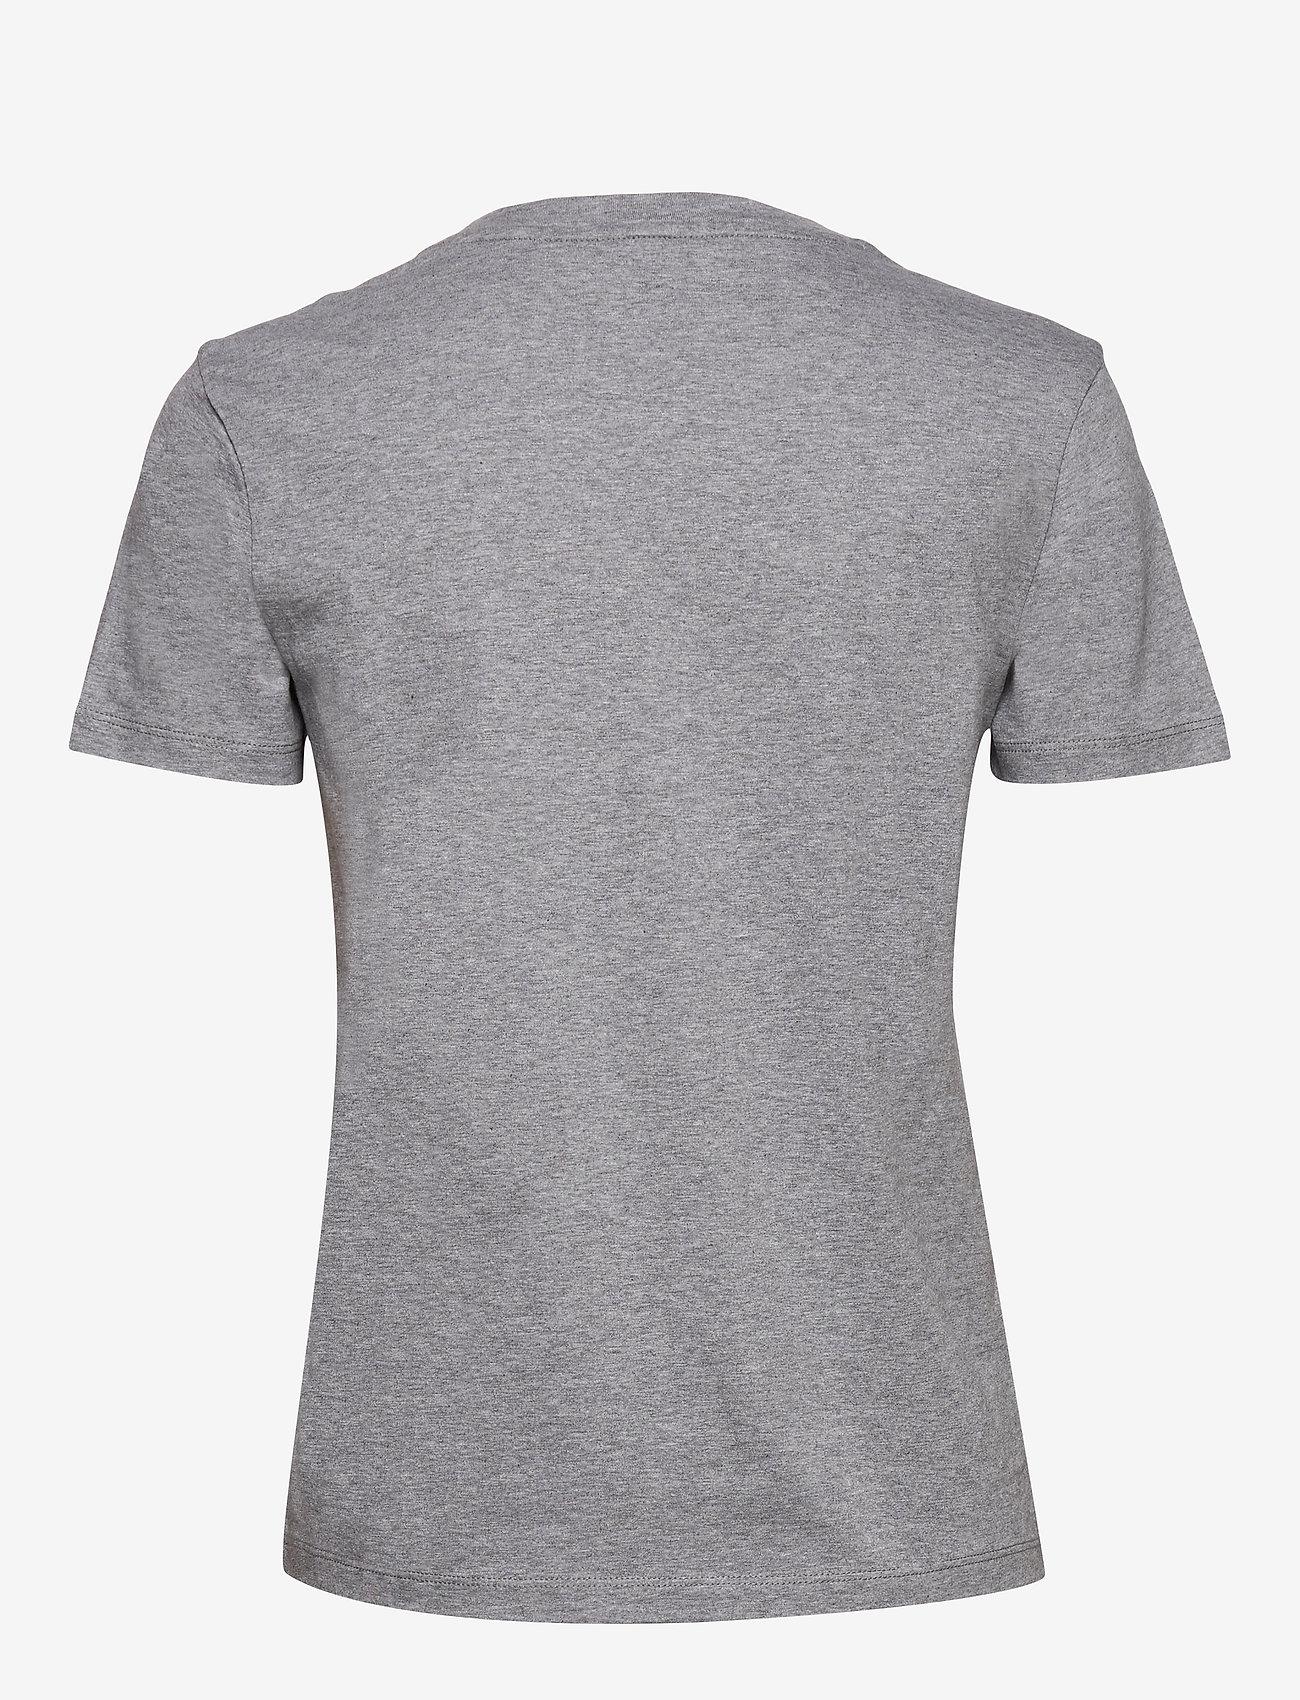 GANT - D1. 13 STRIPES SS T-SHIRT - t-shirts - grey melange - 1